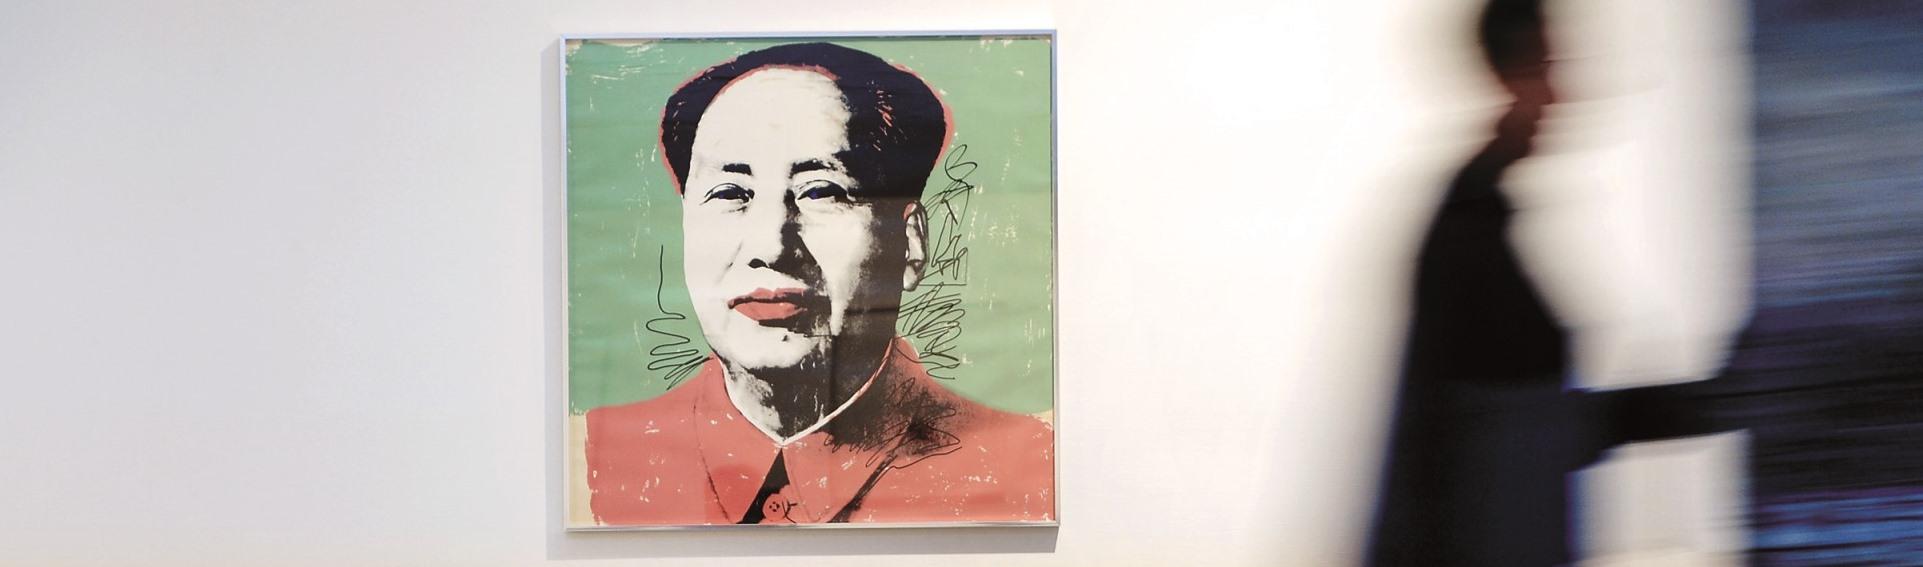 Andy Warhol, Mao, Swanljungin kokoelma _Swanljungs samling, 1972_foto Mikko Lehtimäki